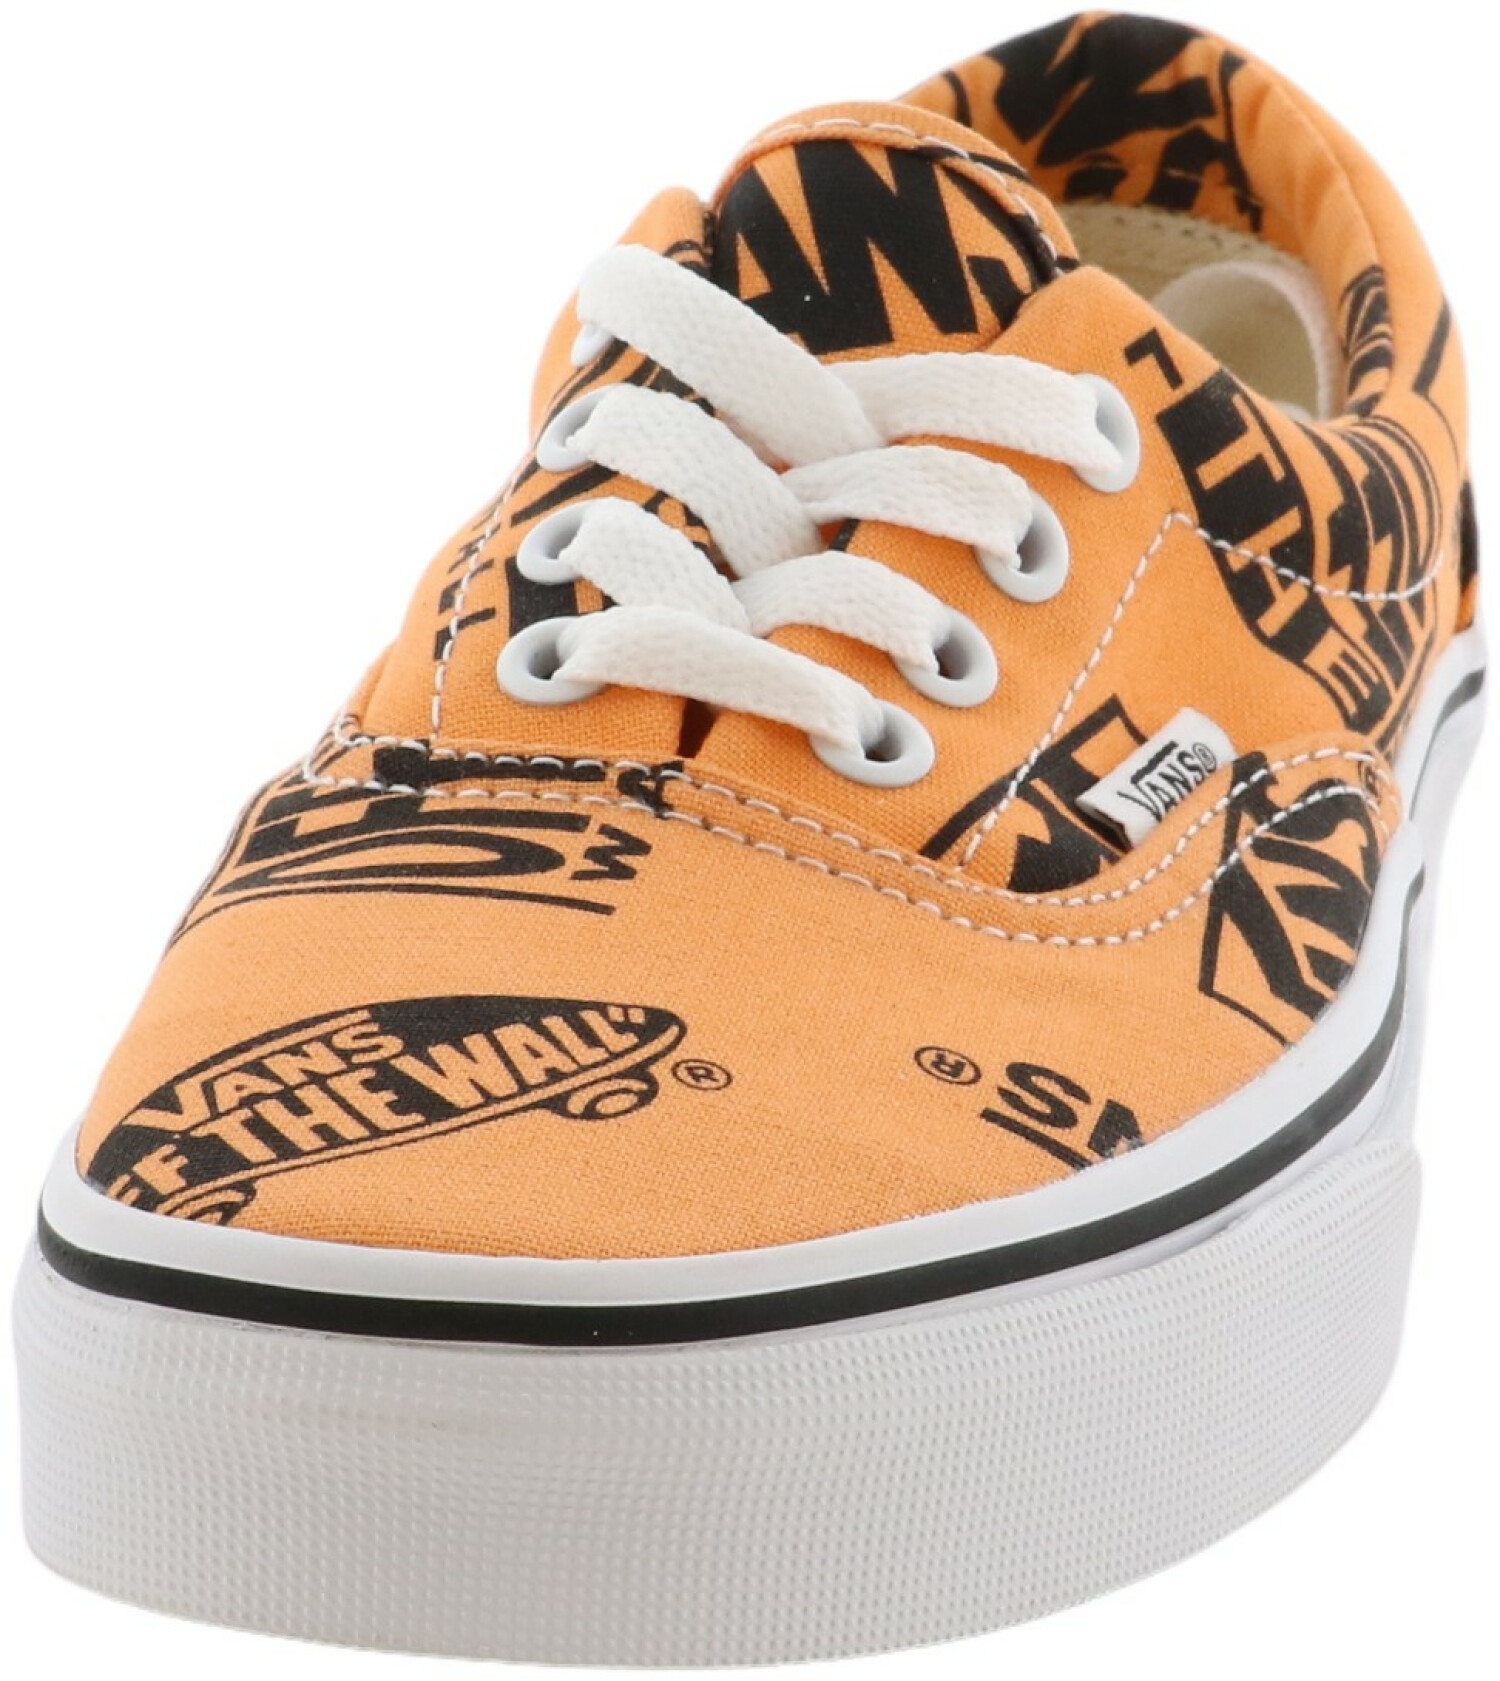 Vans Era Logo Mix Tangerine / Black Low Top Canvas Women' - 6M 4.5M